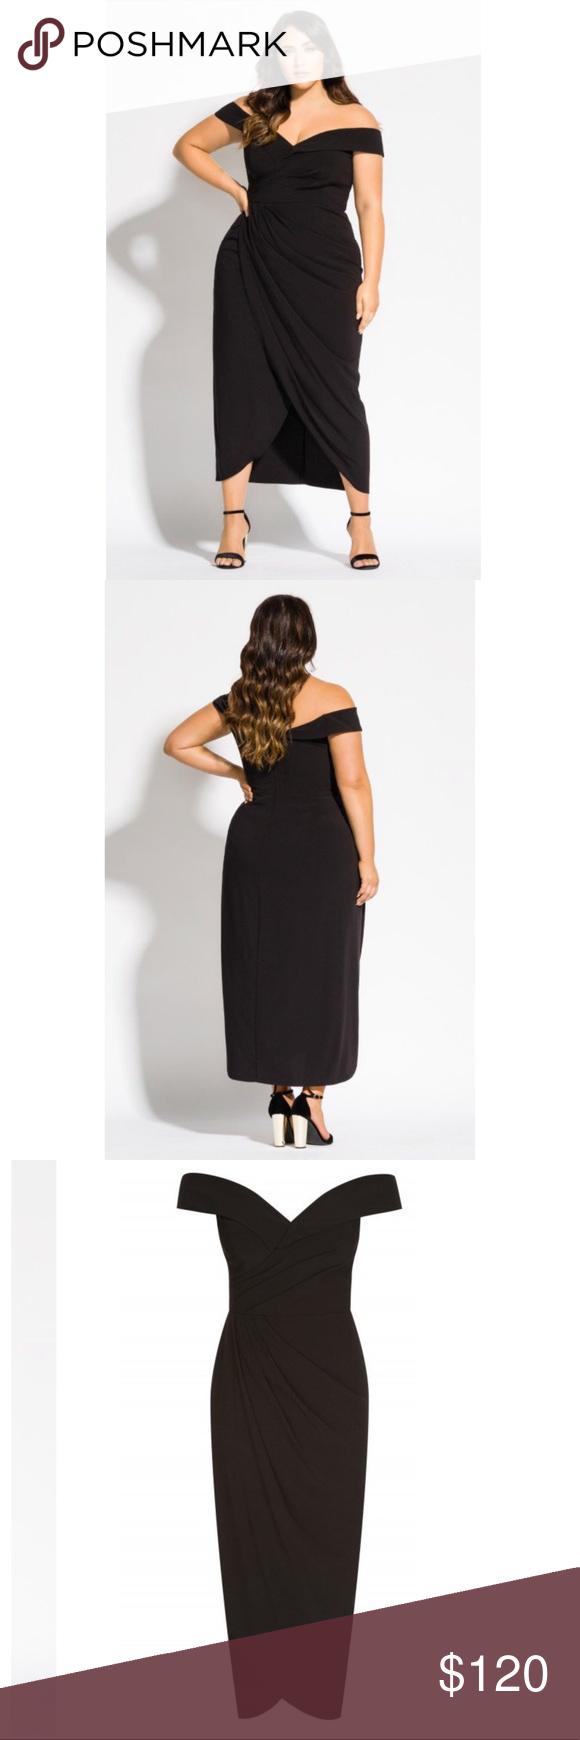 City Chic Size 18 Black Dress Chic Black Dress City Chic Dresses Black Strapless Maxi Dress [ 1740 x 580 Pixel ]